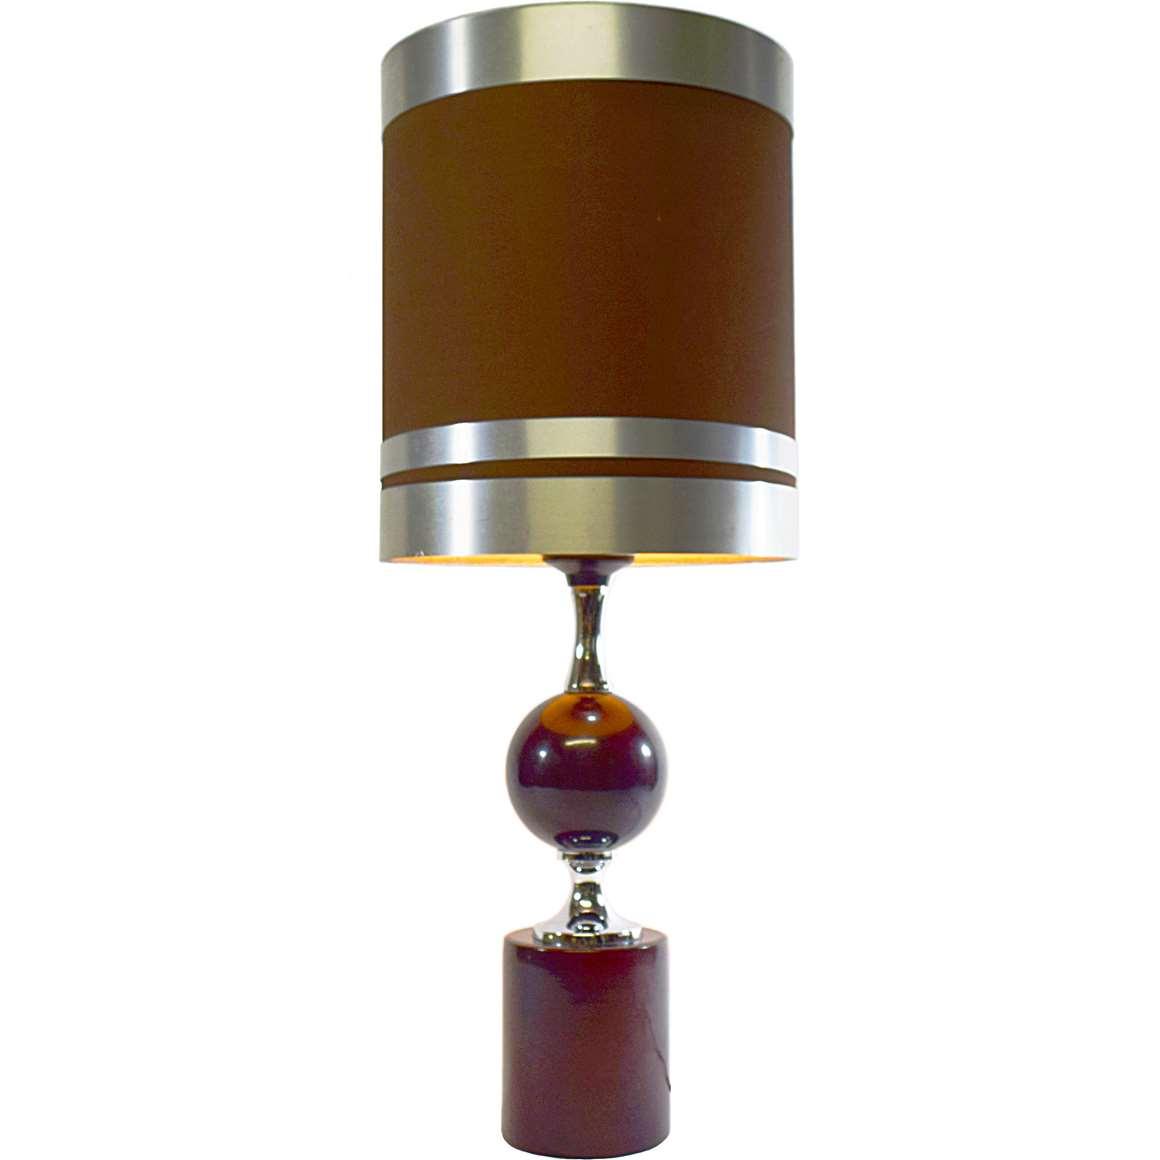 Philippe Barbier Aubergine Table Lamp